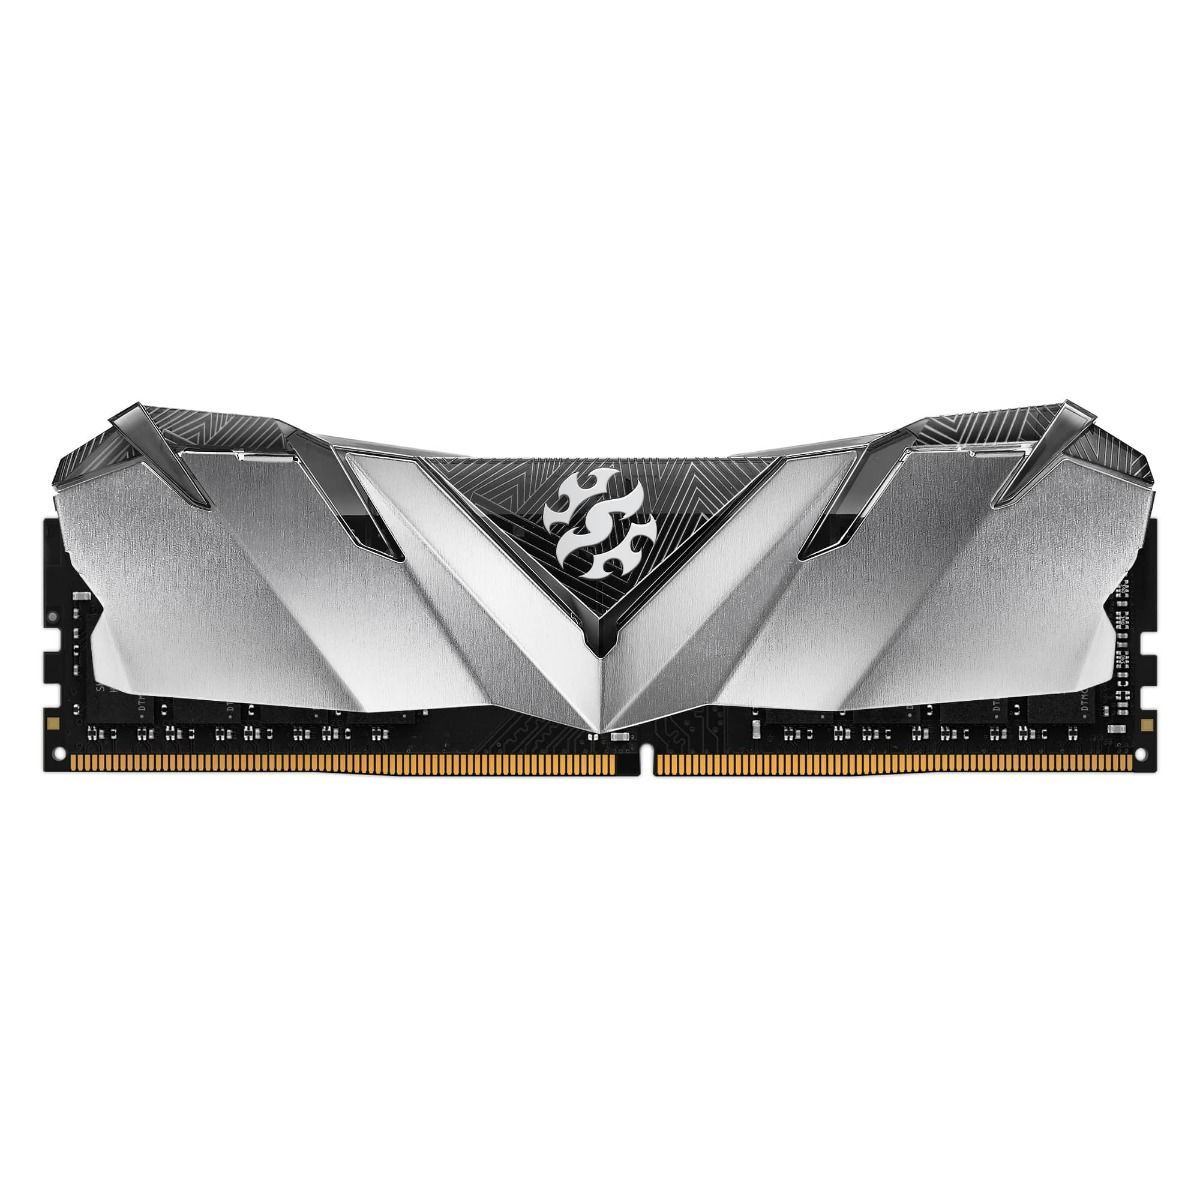 MEMORIA DESKTOP ADATA XPG GAMMIX 8GB DDR4 2666MHZ AX4U266638G16SB30